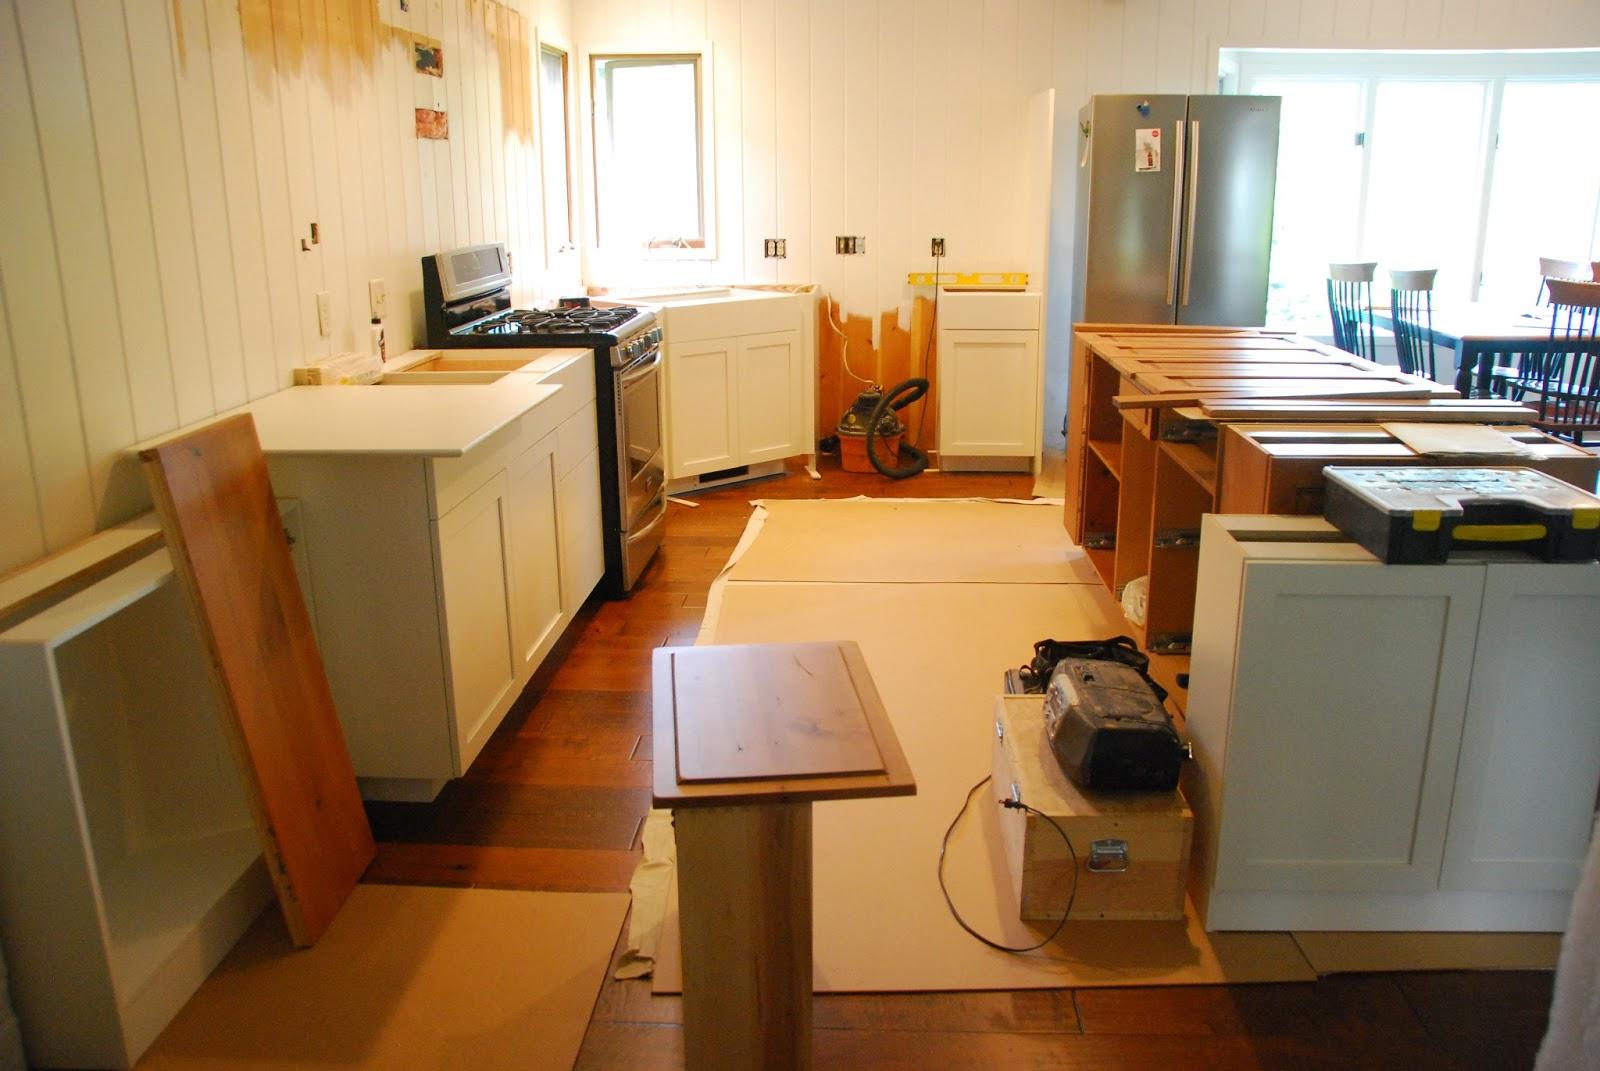 U Kitchen Remodel